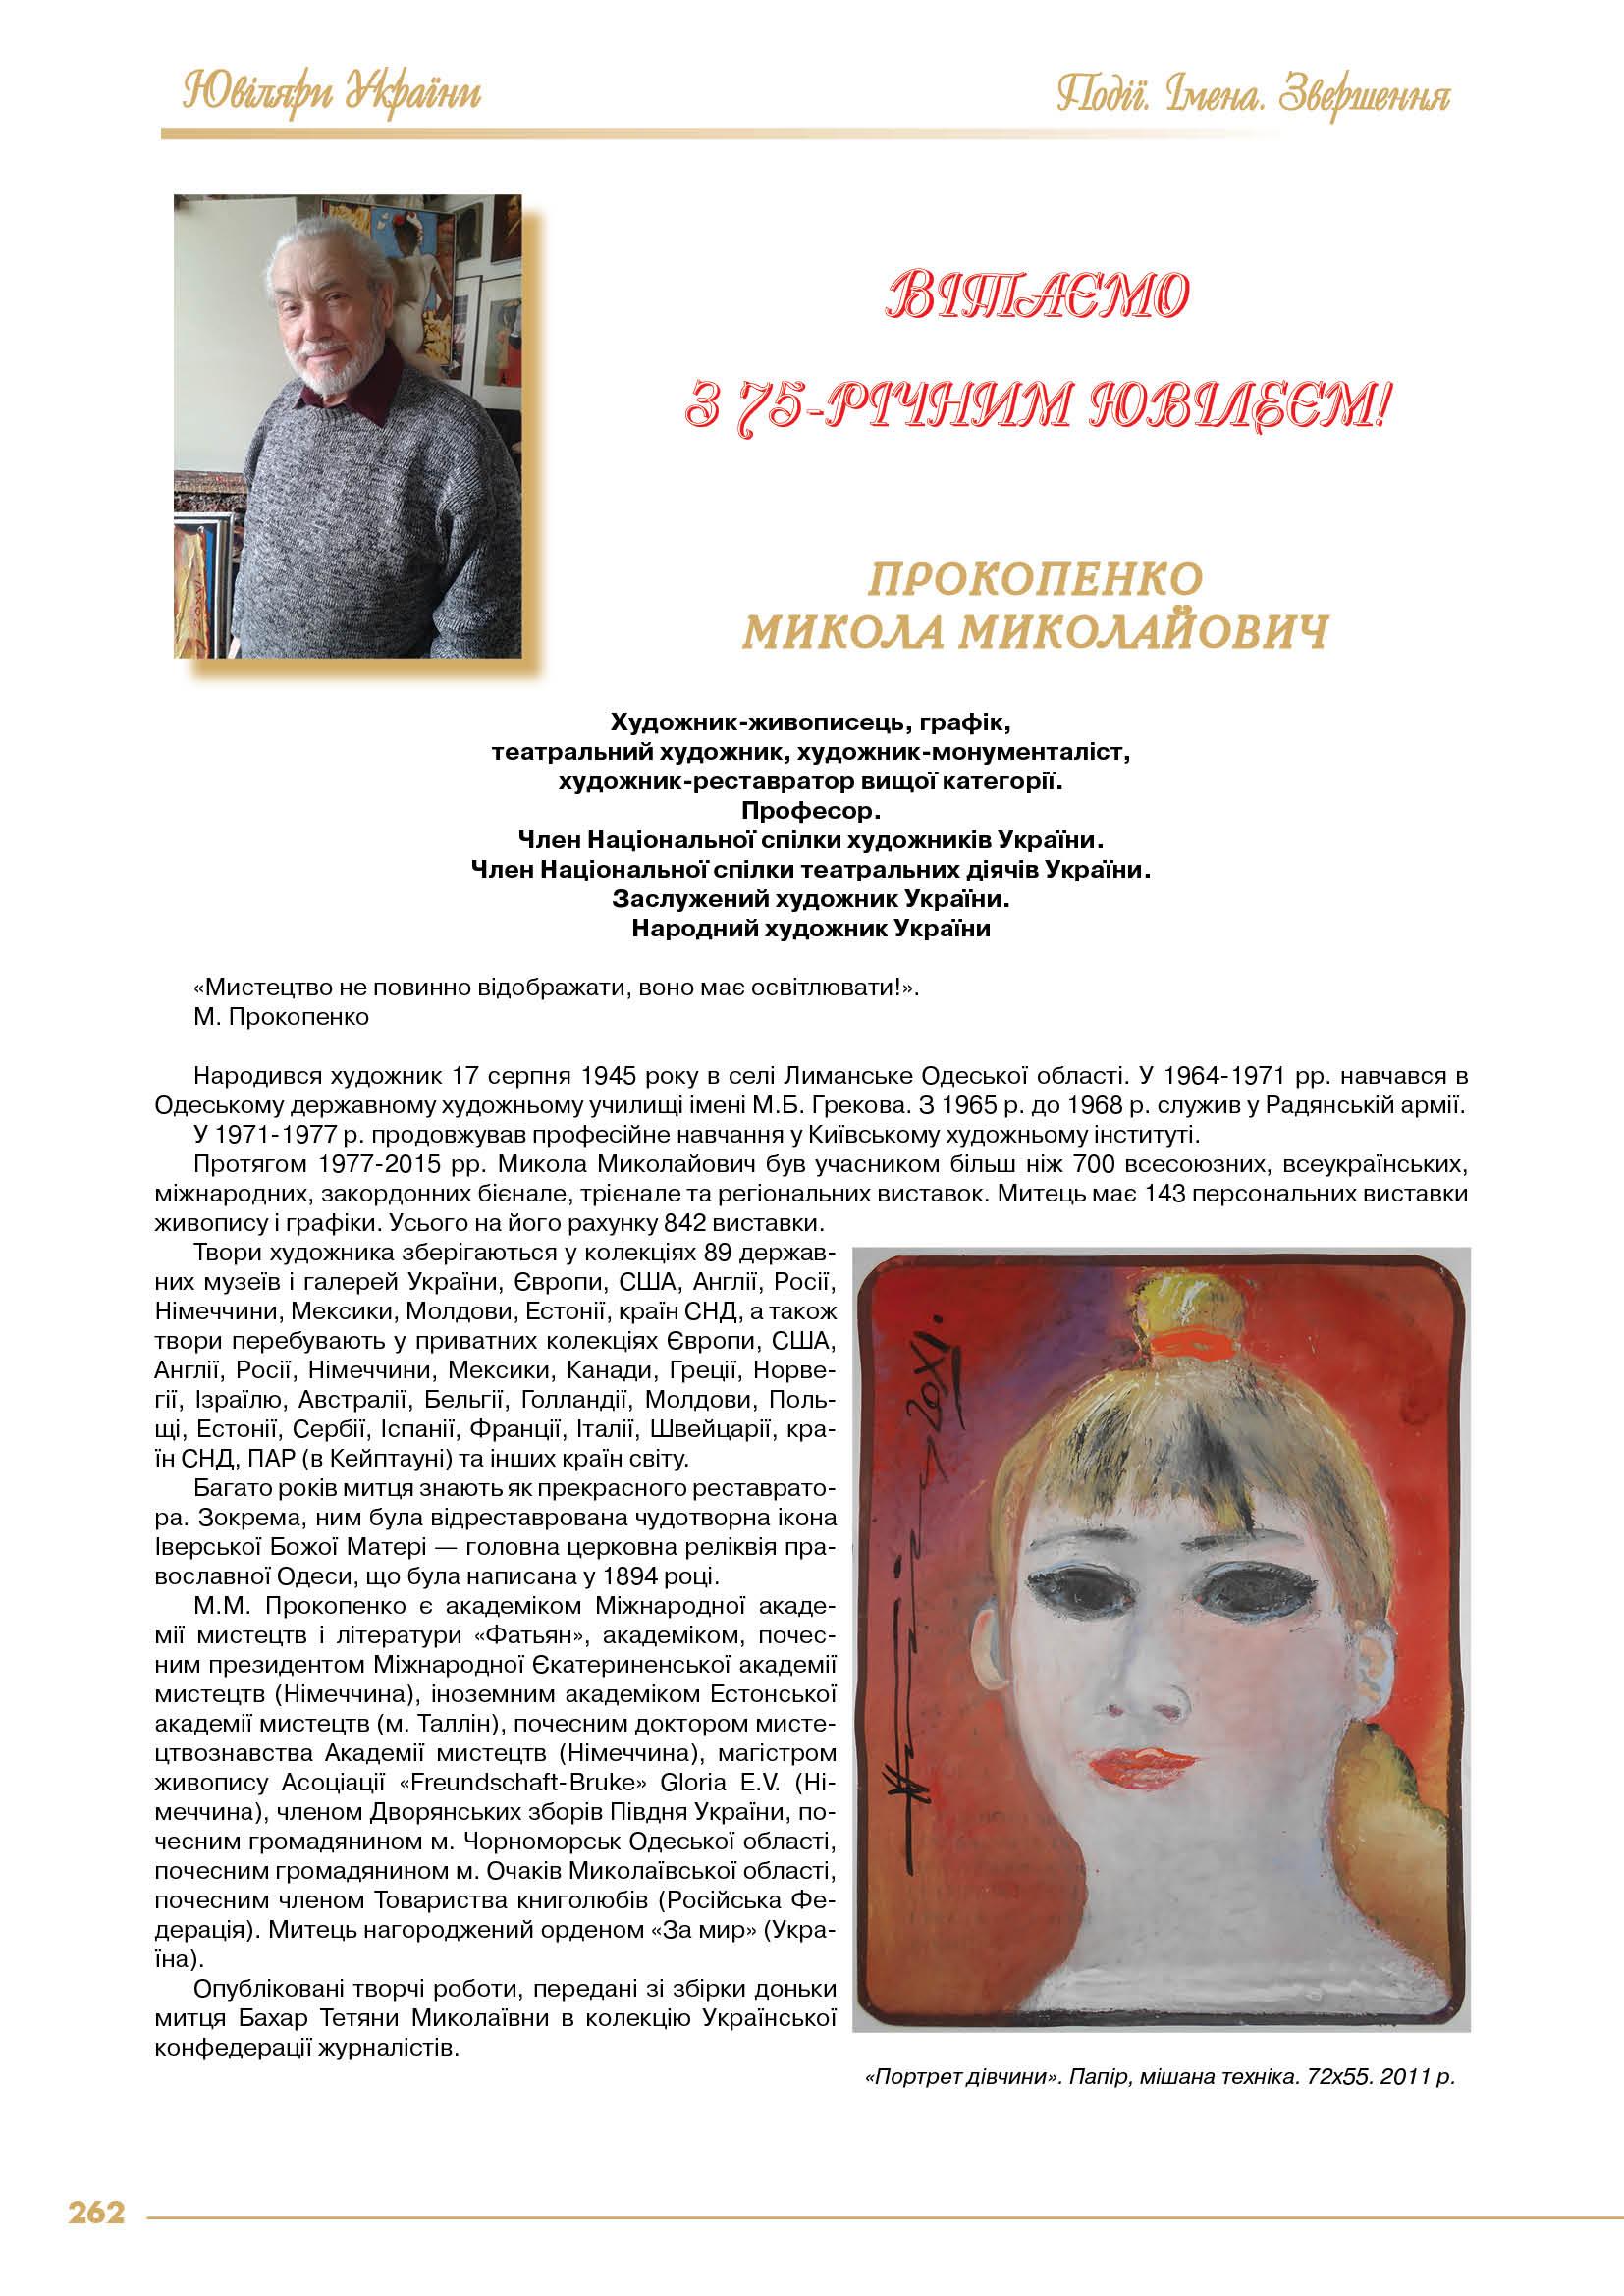 Прокопенко Микола Миколайович